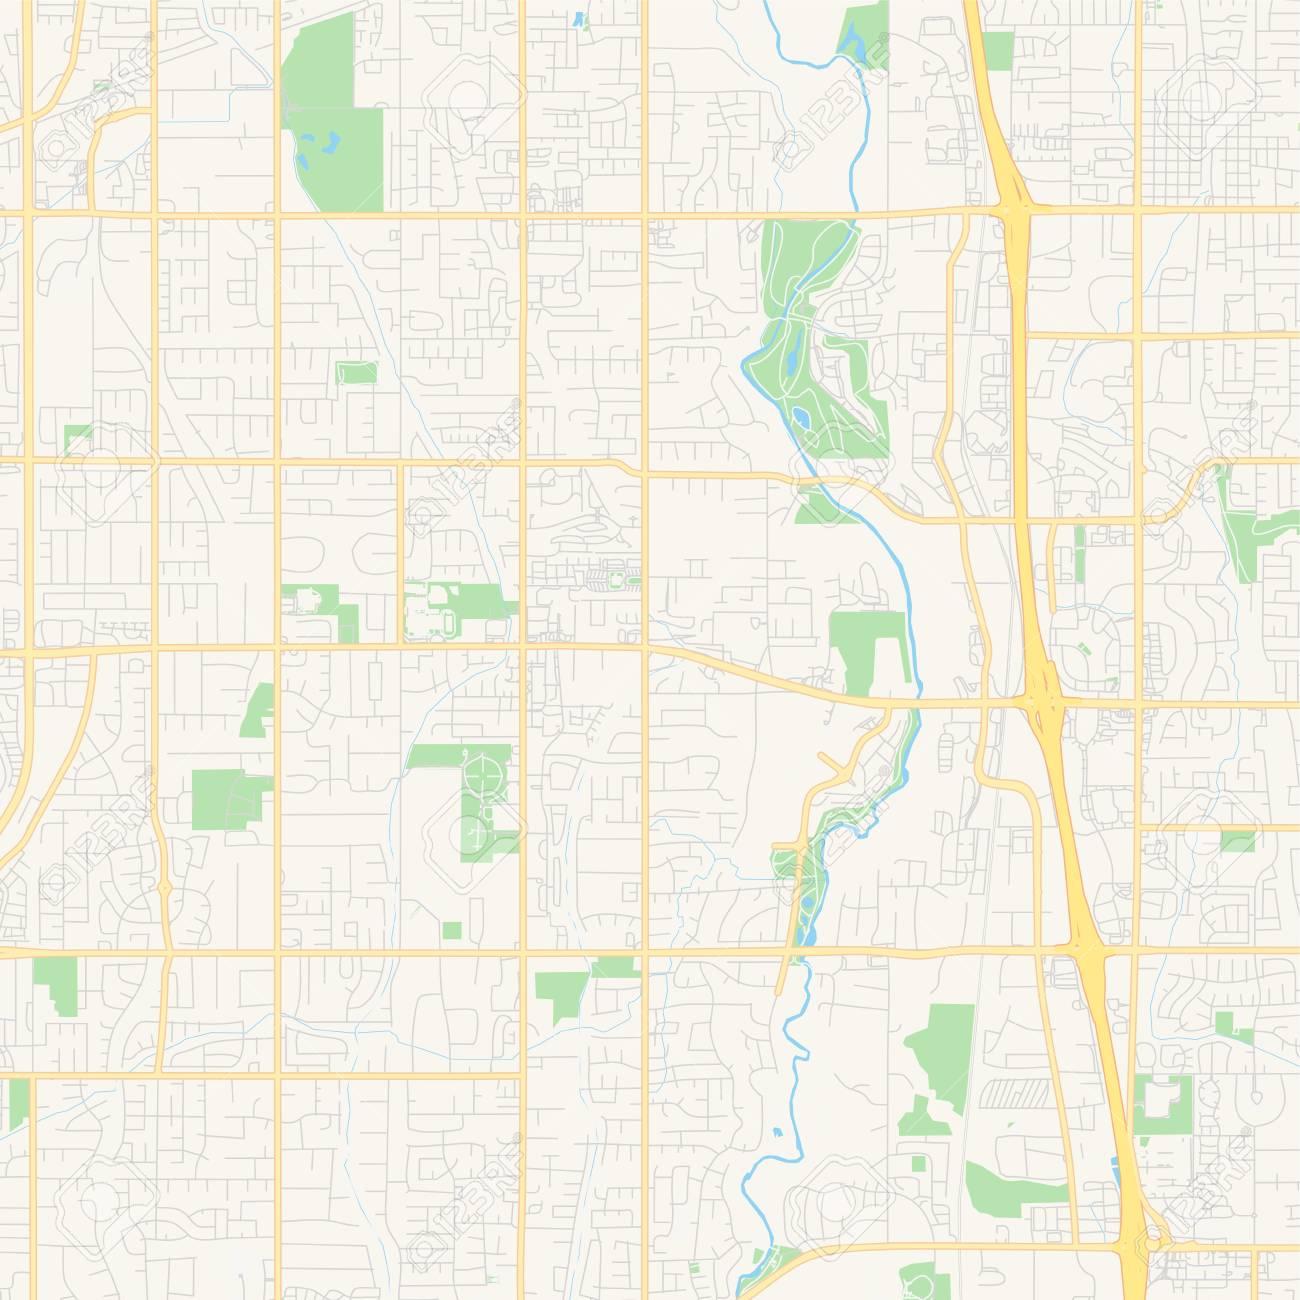 photo relating to Printable Map of Utah identify Vacant vector map of South Jordan, Utah, United states of america, printable highway map..